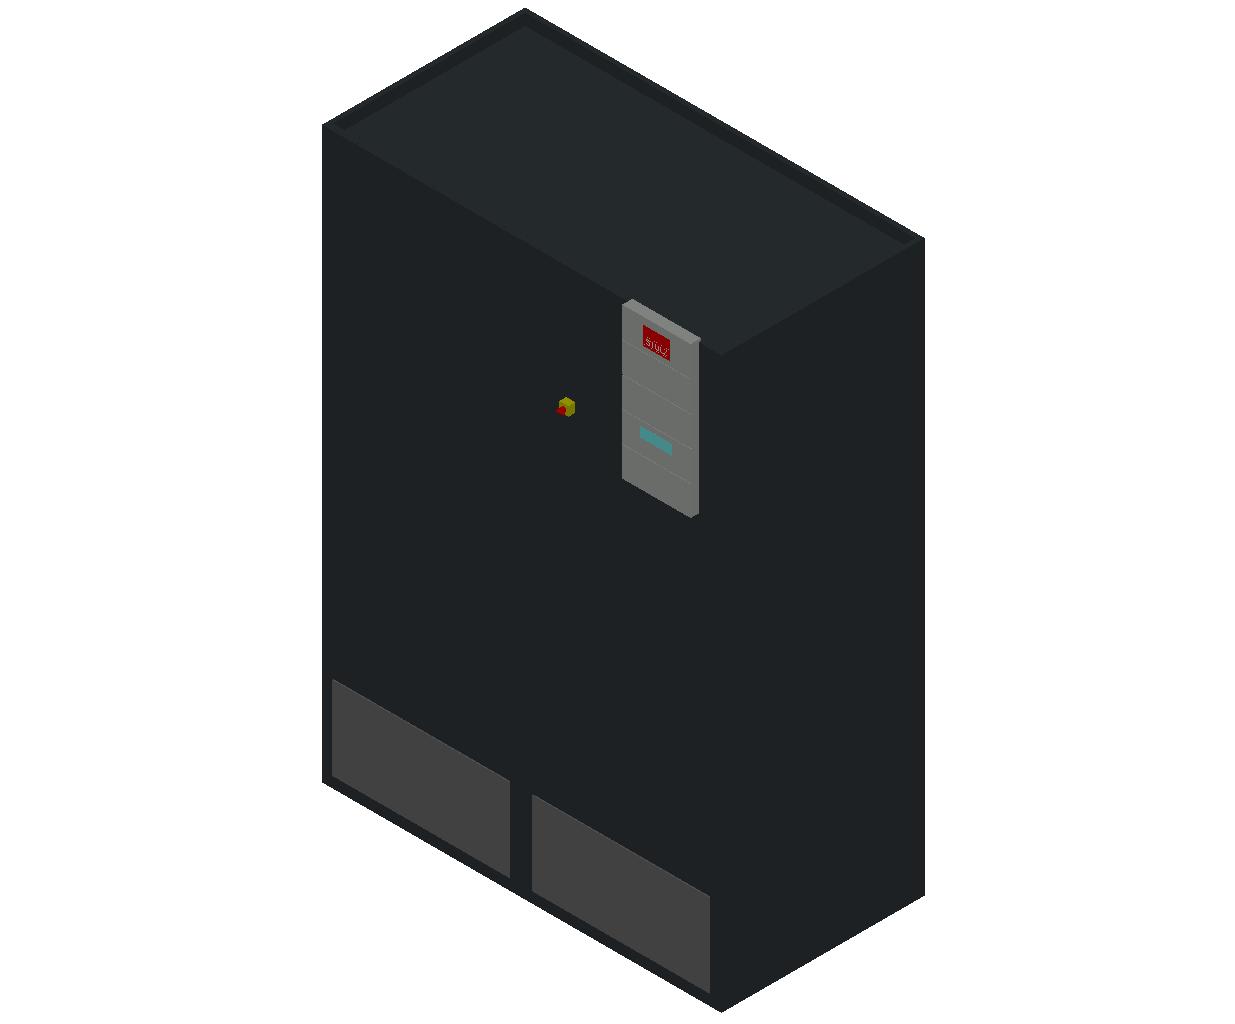 HC_Air Conditioner_Indoor Unit_MEPcontent_STULZ_CyberAir 3PRO_ASR_CW_ASR_1040_CW_INT-EN.dwg